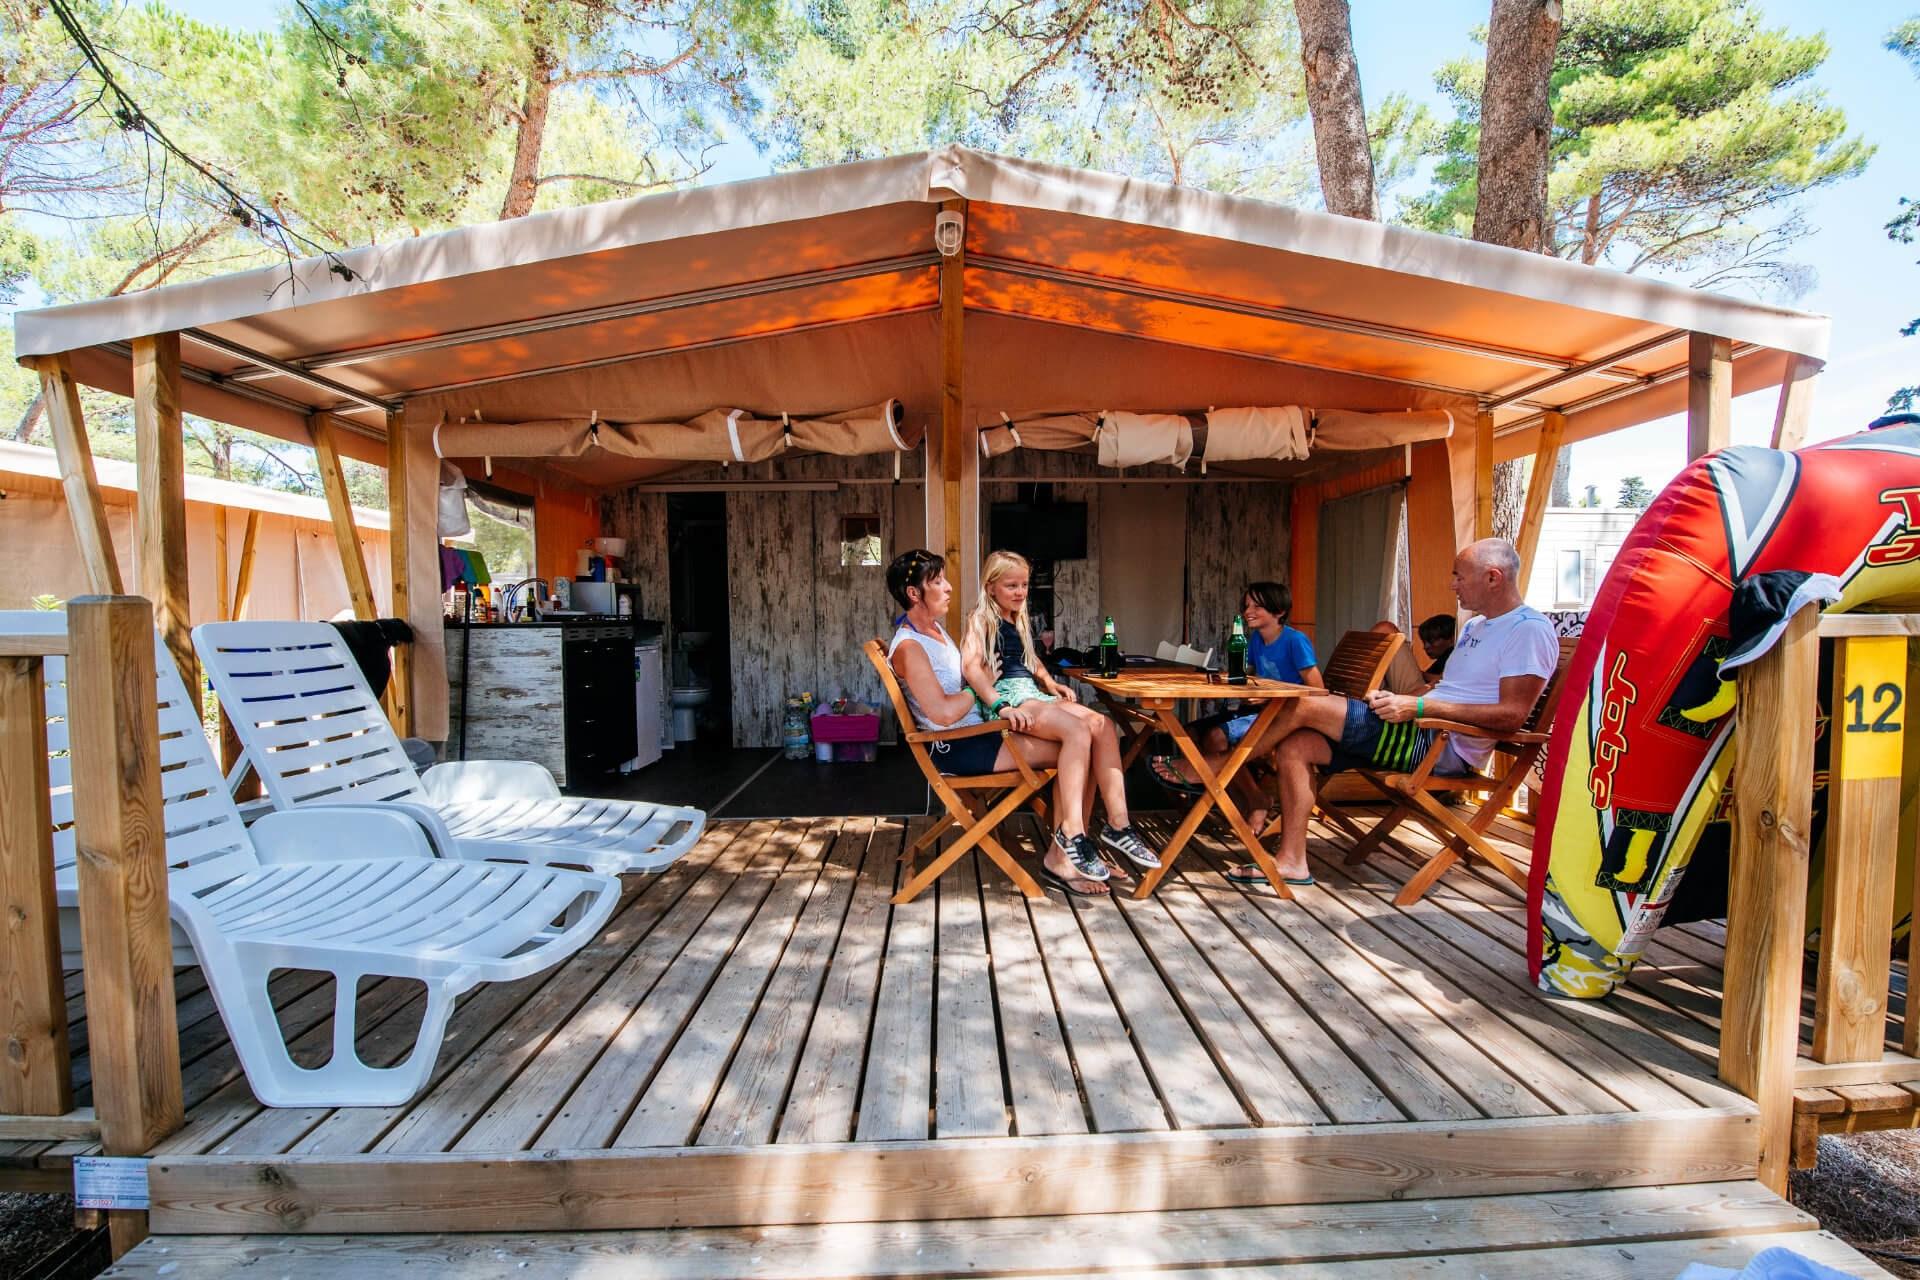 Zaton Holiday Resort - Zadar Region, Dalmatia | Top ...